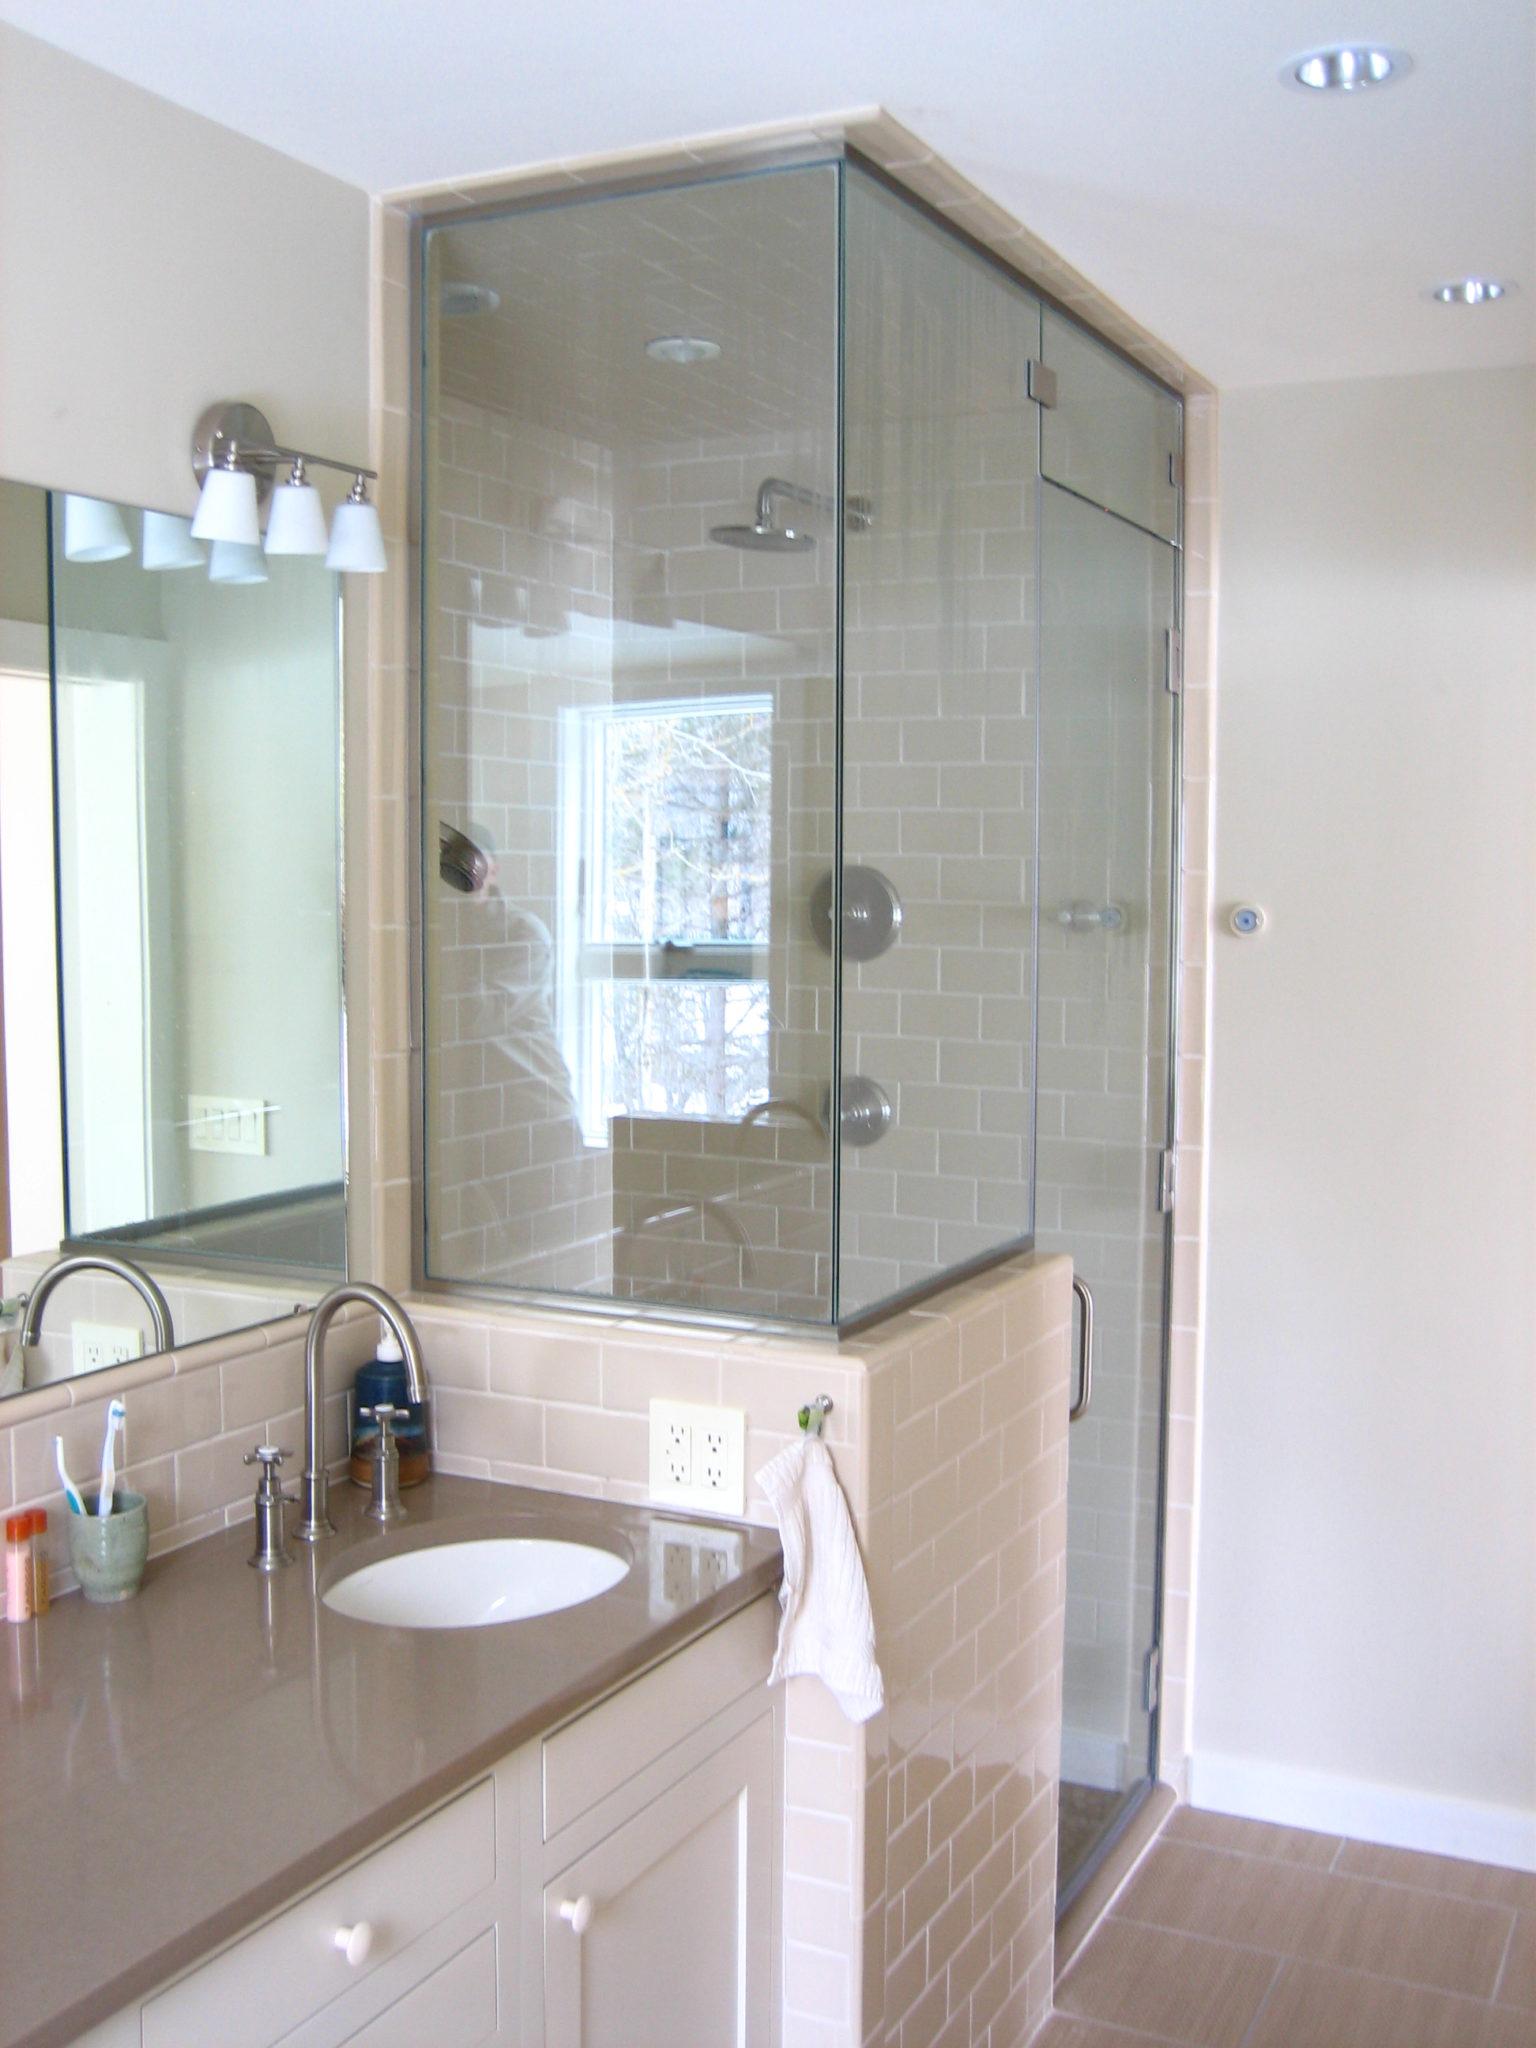 Bathroom remodeling Camden Maine- Home Remodeling